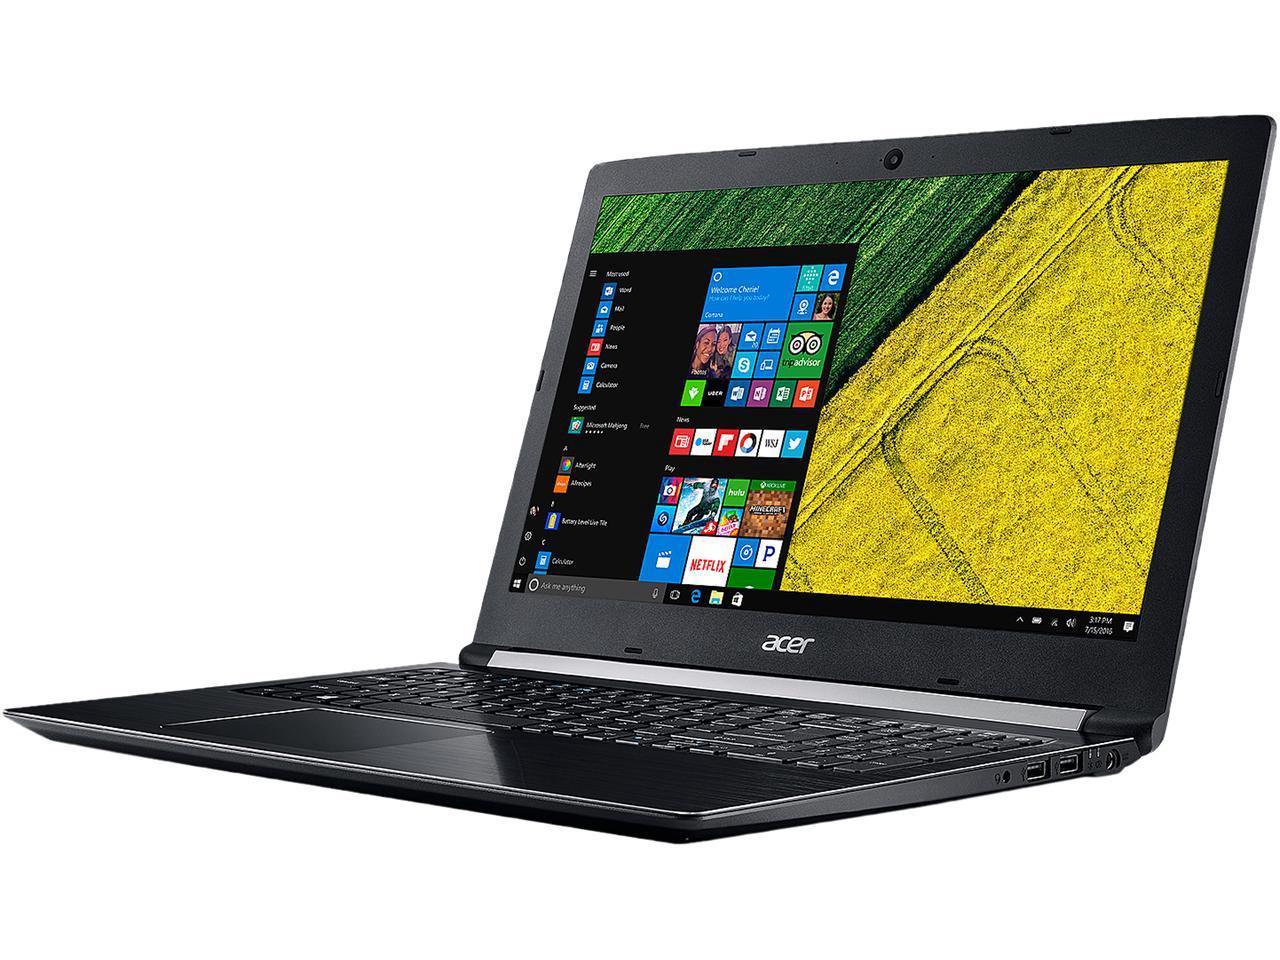 "Acer Laptop Aspire 5 Intel Core i7 8th Gen 8550U (1.80 GHz) 8 GB Memory 256 GB SSD NVIDIA GeForce MX150 15.6"" Windows 10 Home 64-Bit A515-51G-89LS $599"